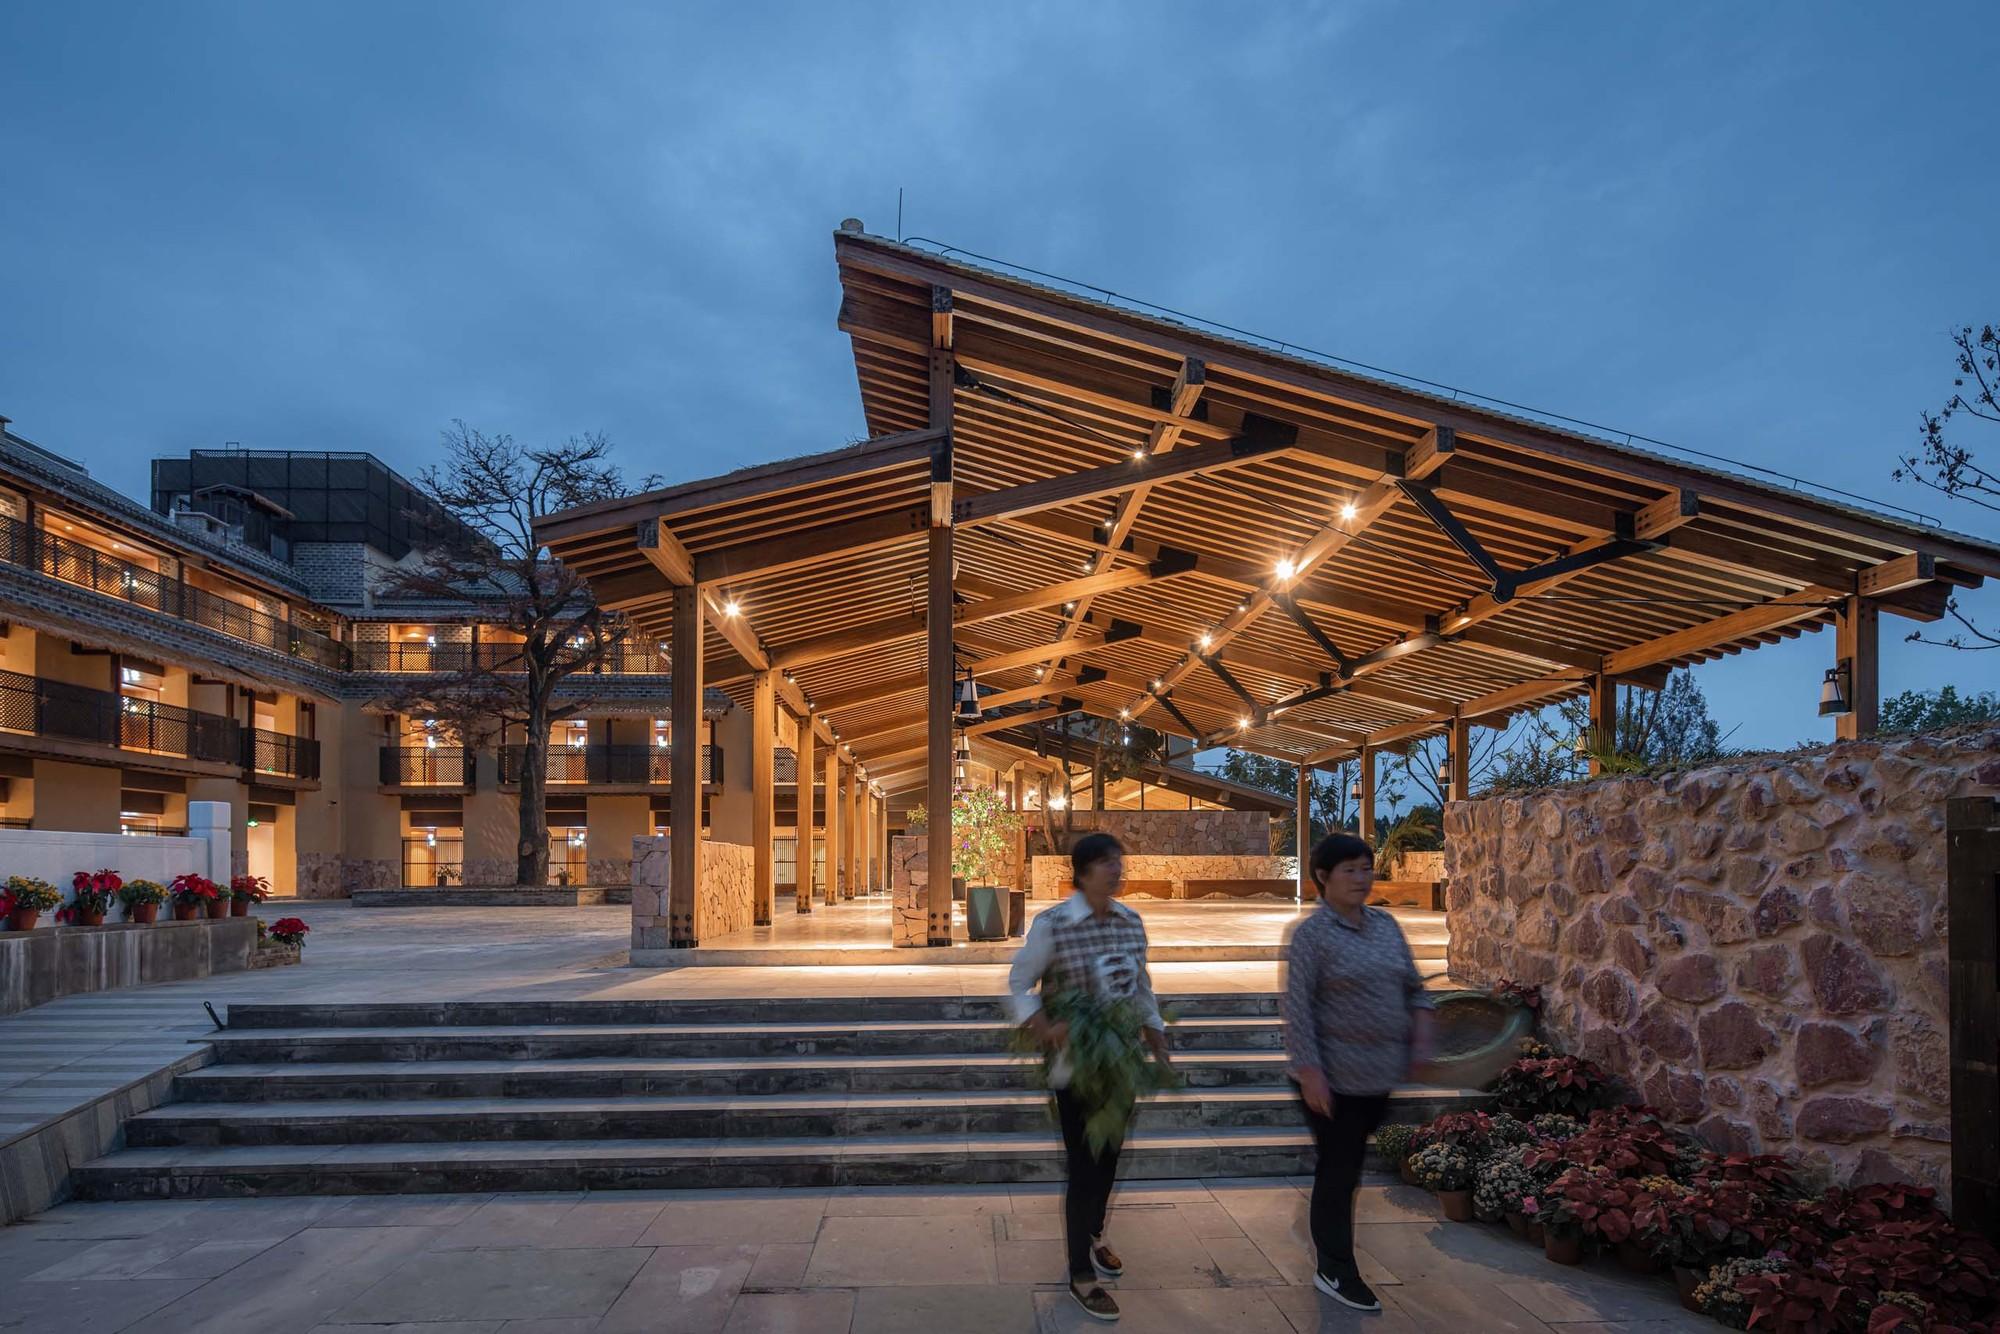 Lixiang Village Public Space / AESEU Architectural Technology and Art studio